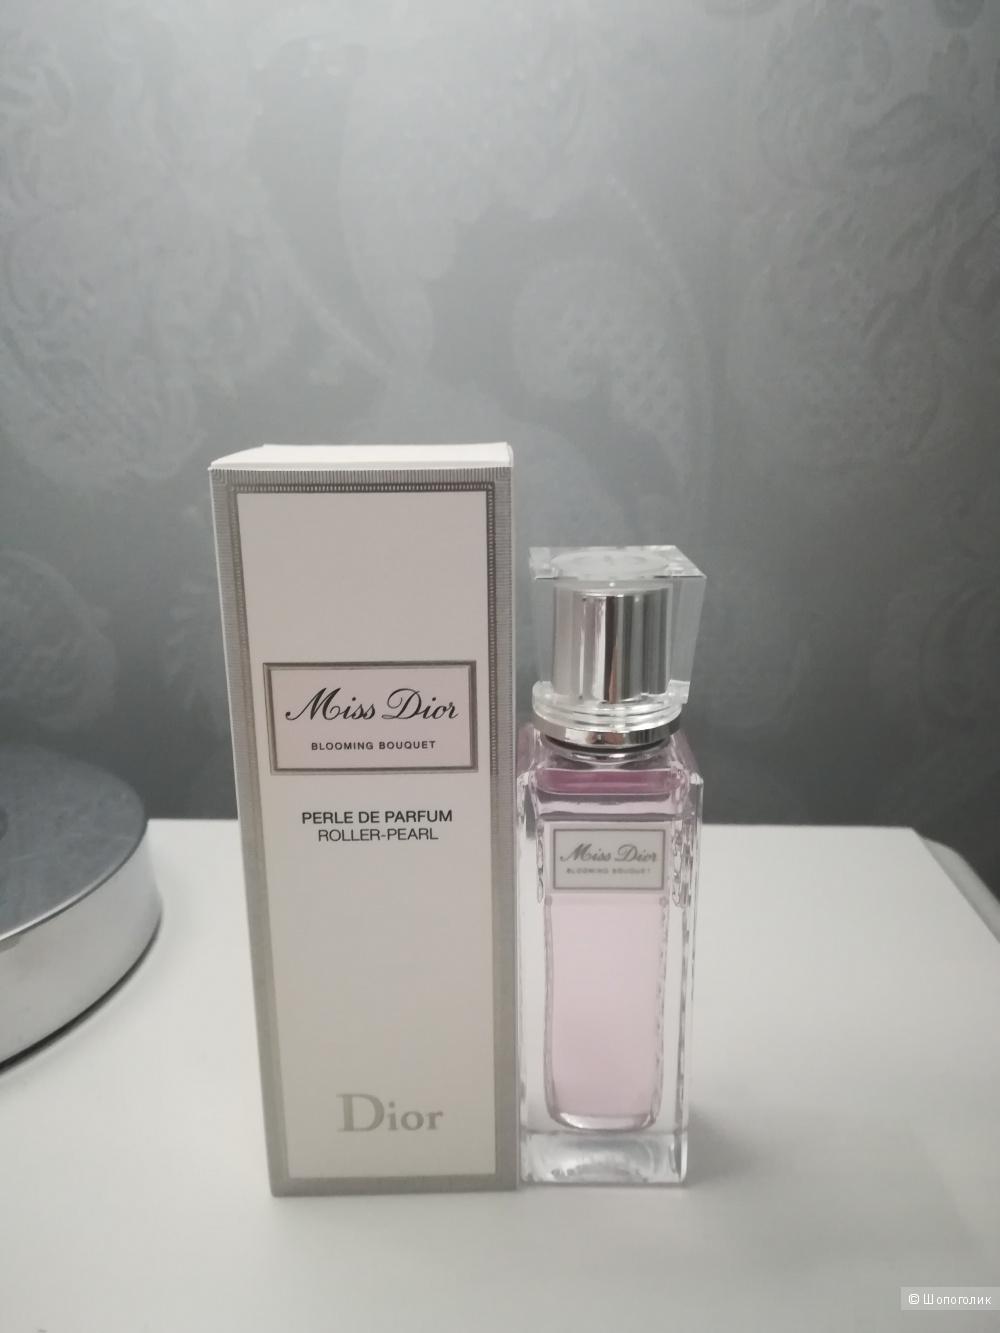 Парфюмерная вода Miss dior blooming bouquet, 20 мл